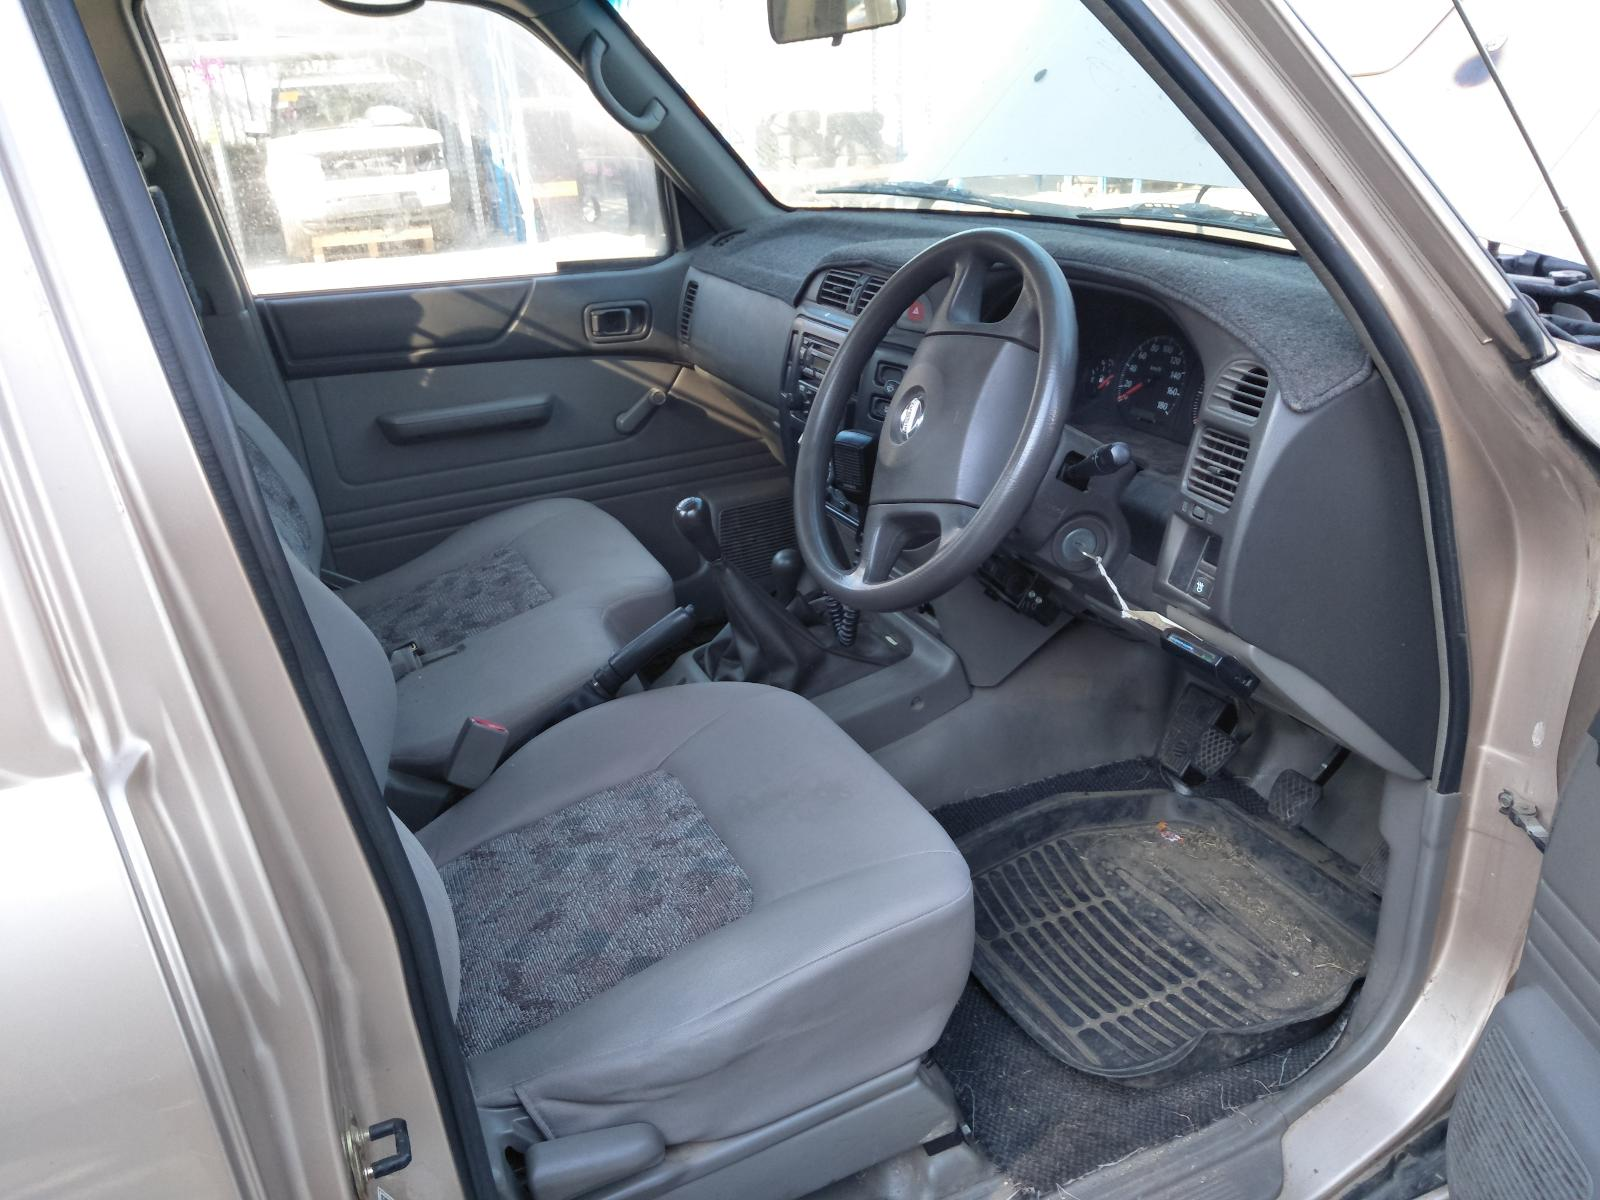 View Auto part Trim Panel Nissan Patrol 2004